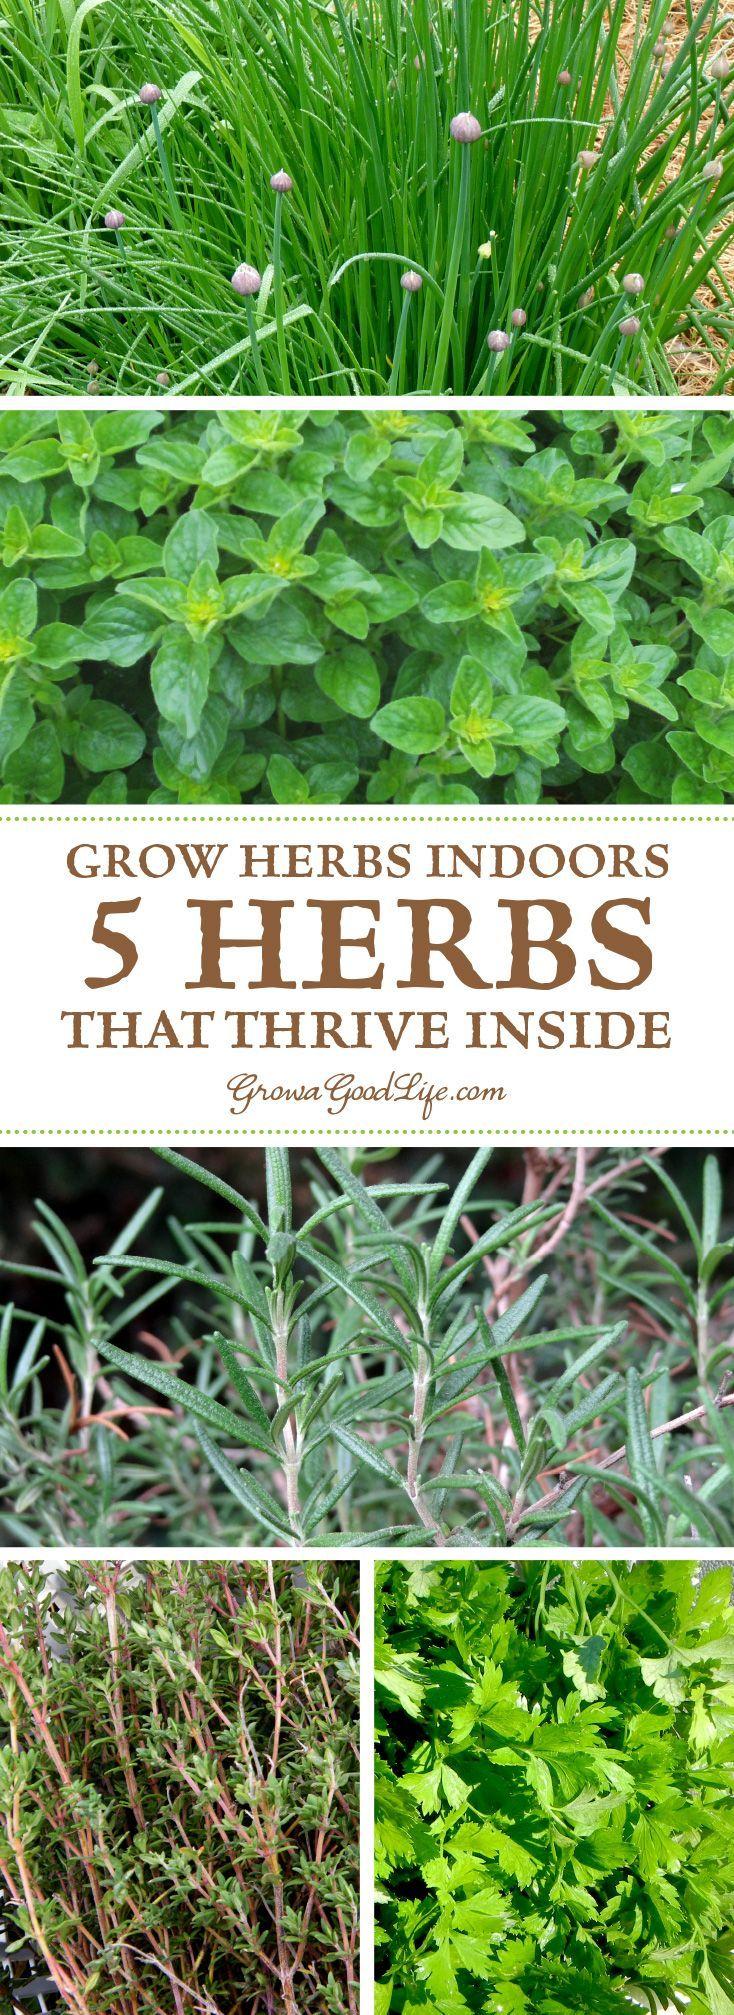 Grow Herbs Indoors 5 Herbs That Thrive Inside Herb 400 x 300